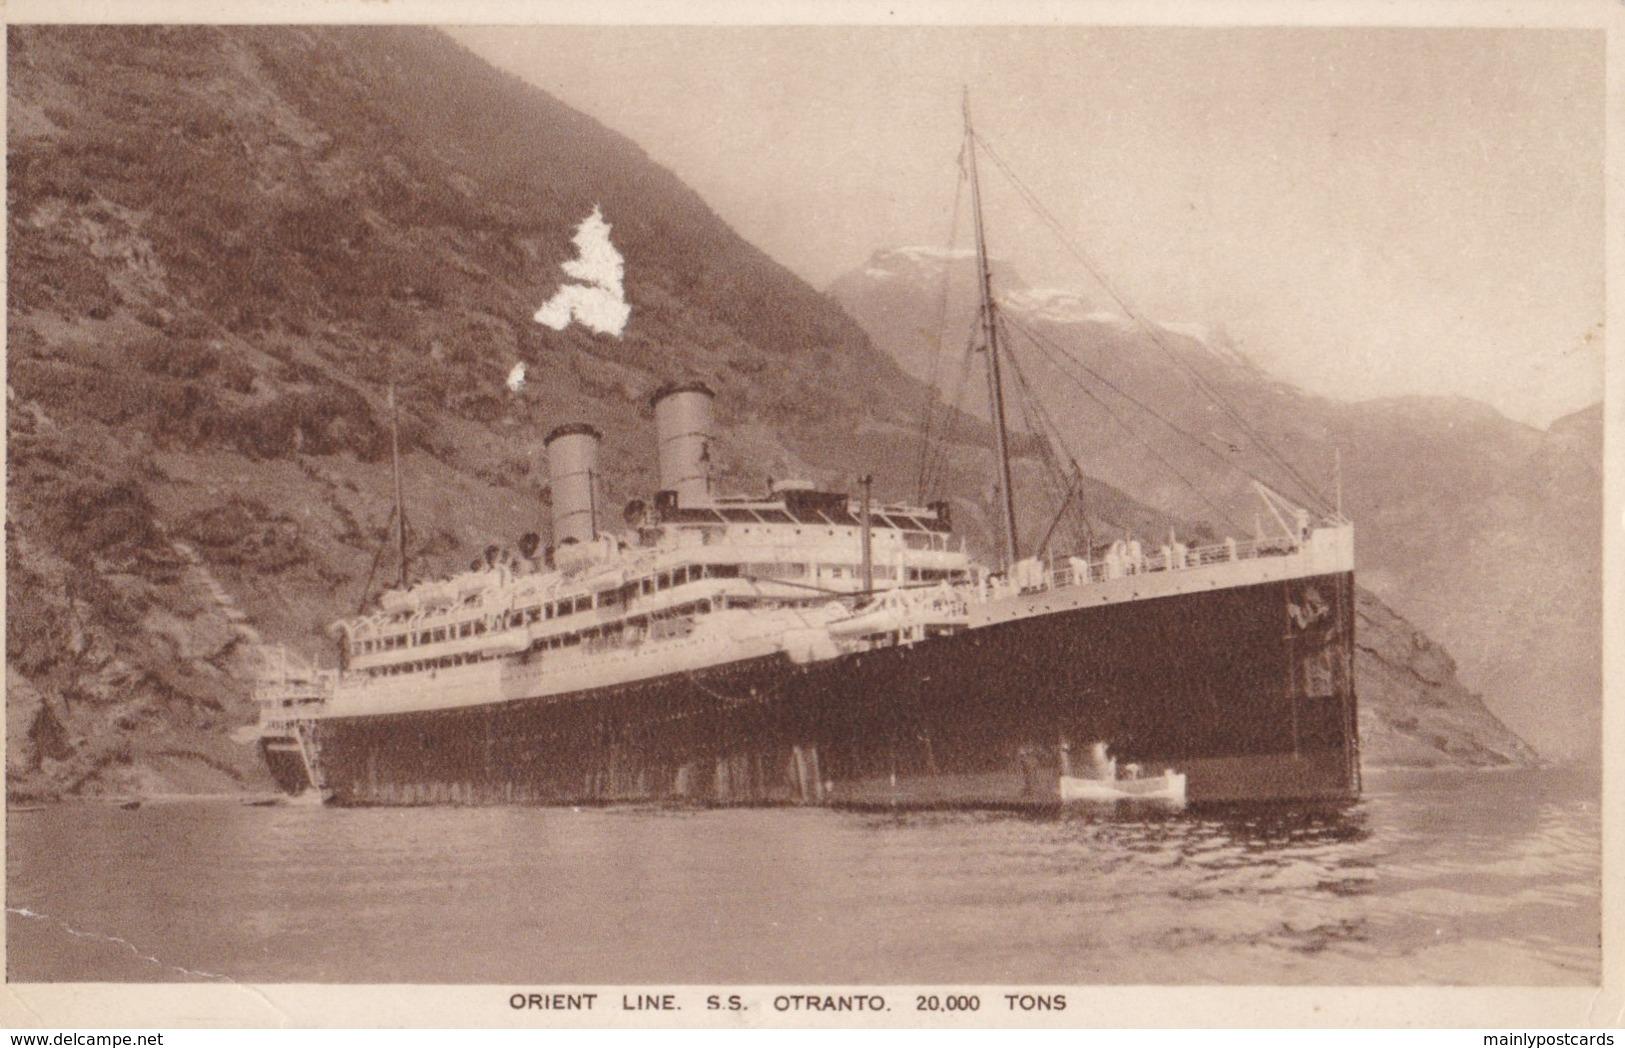 AP44 Shipping - Orient Line S.S. Otranto - Steamers